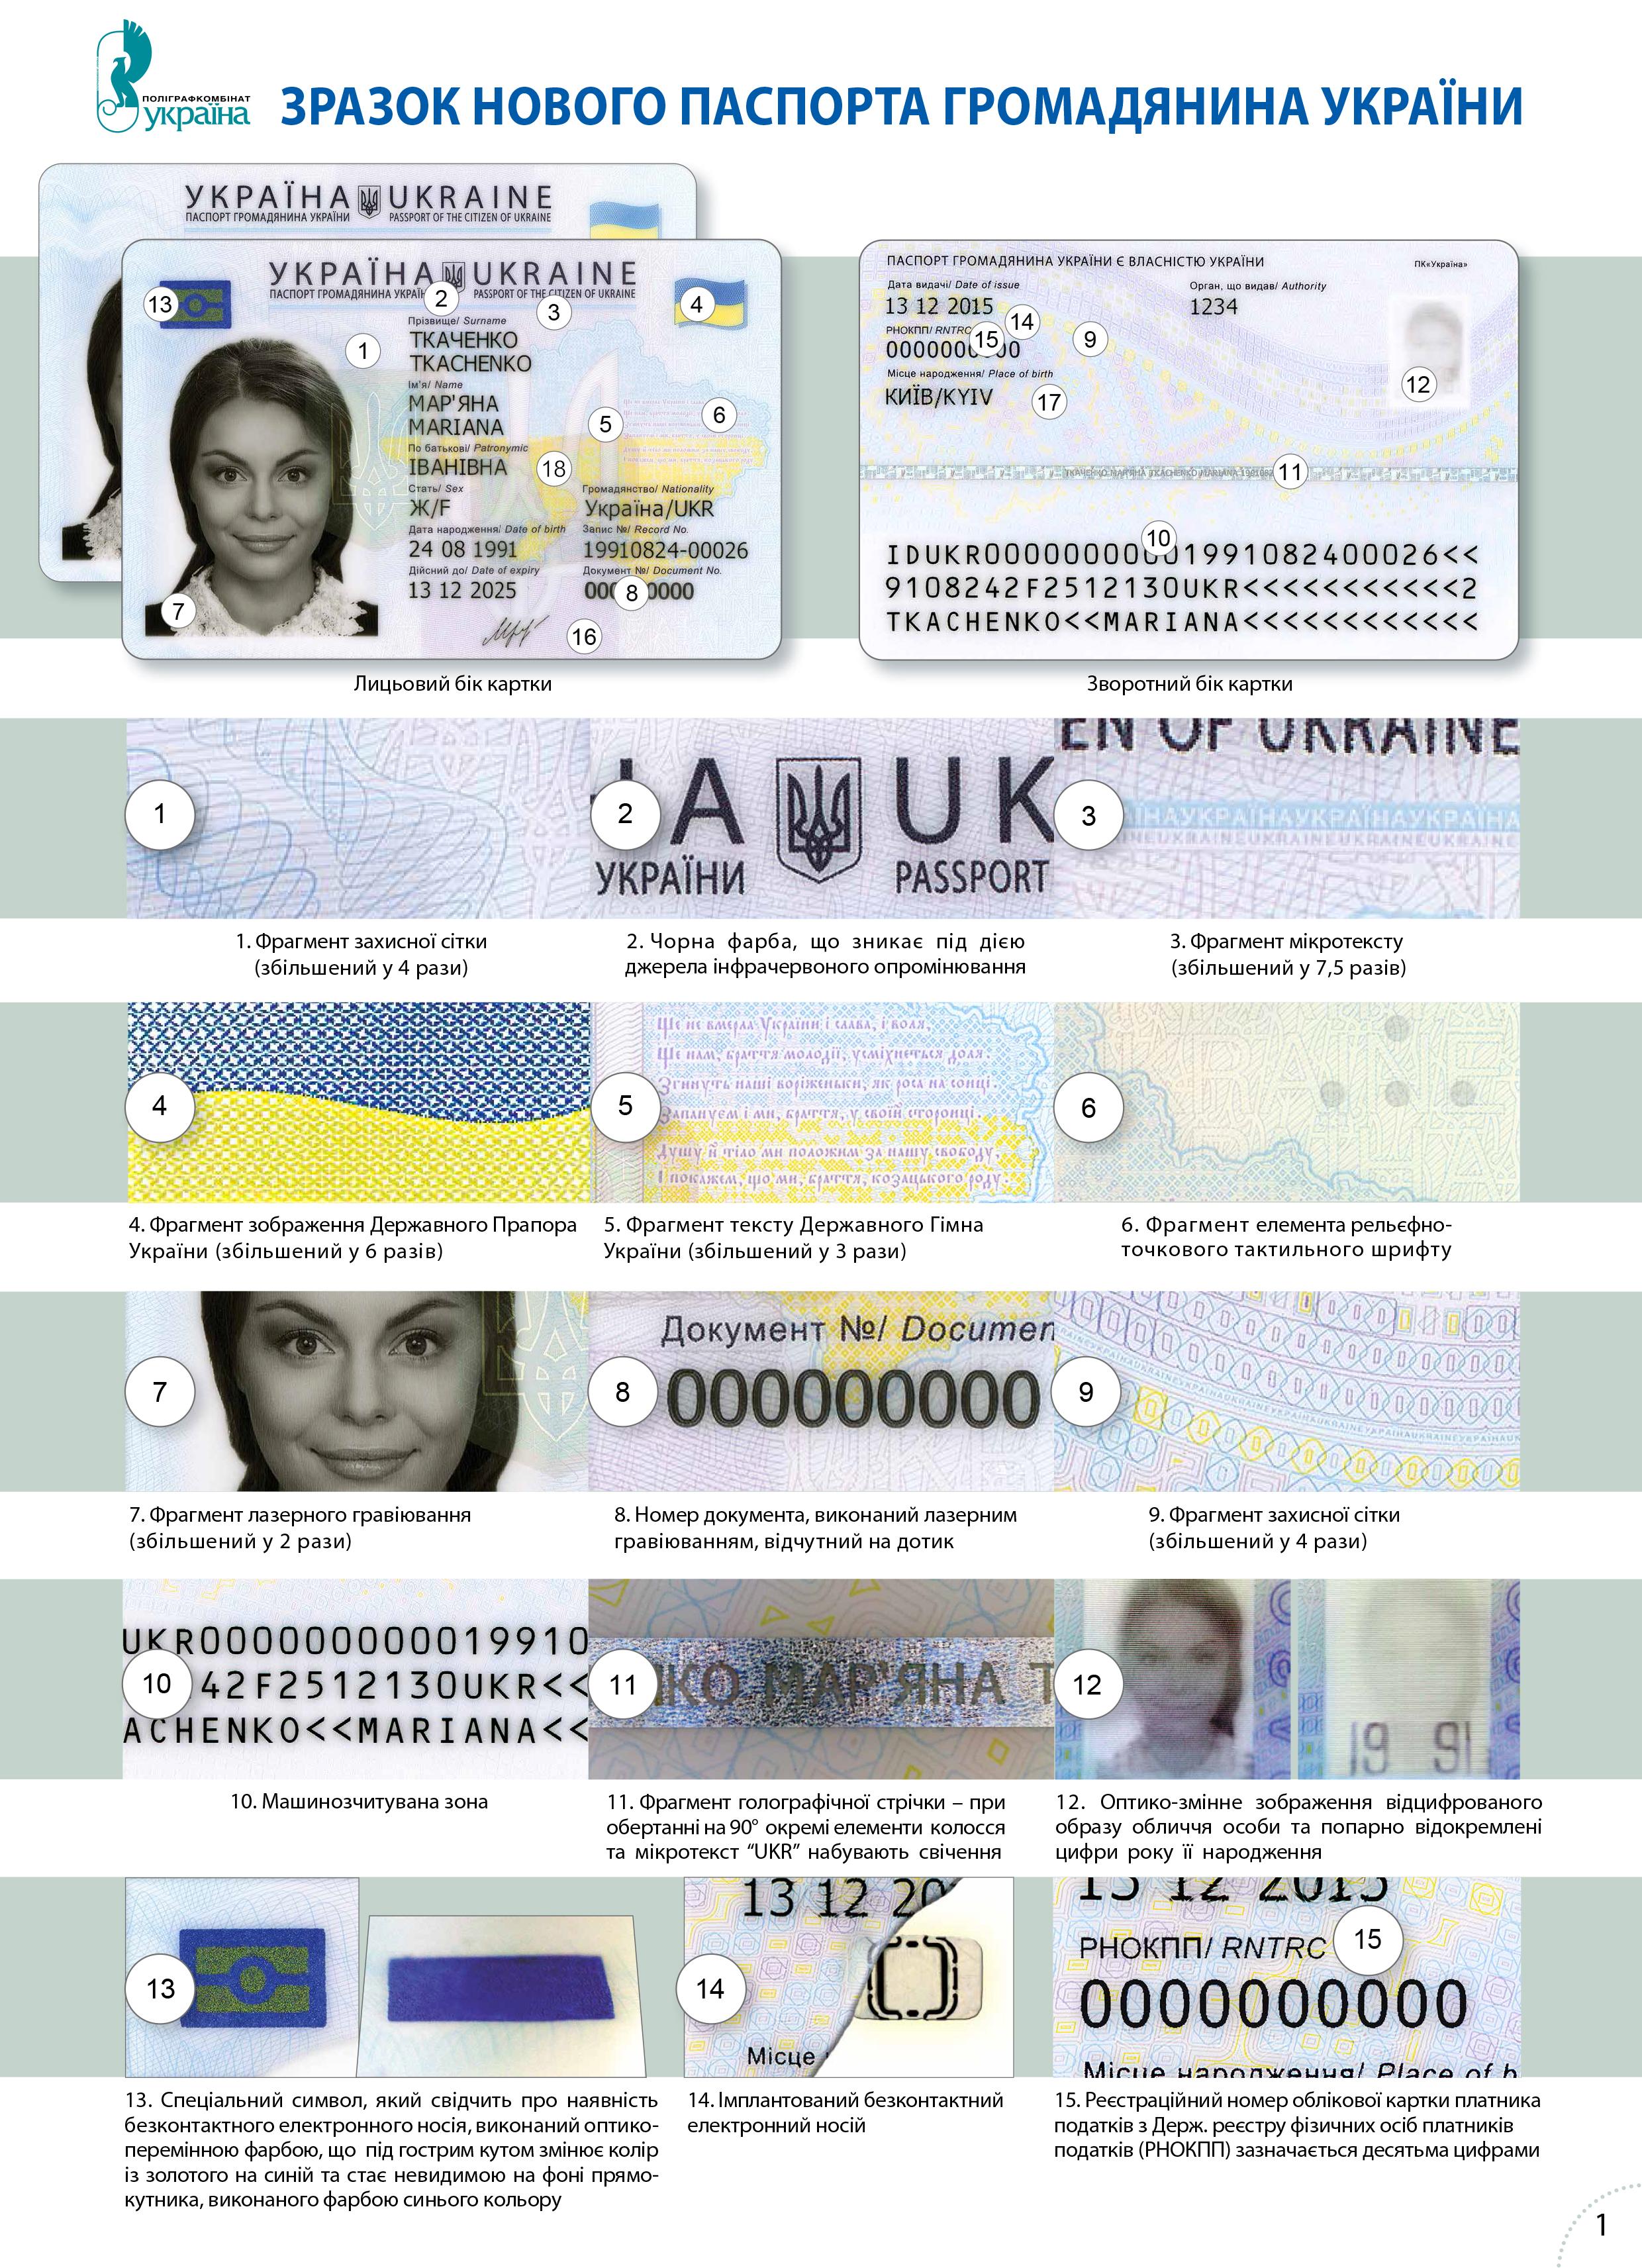 Зразок ID паспорта громадянина України